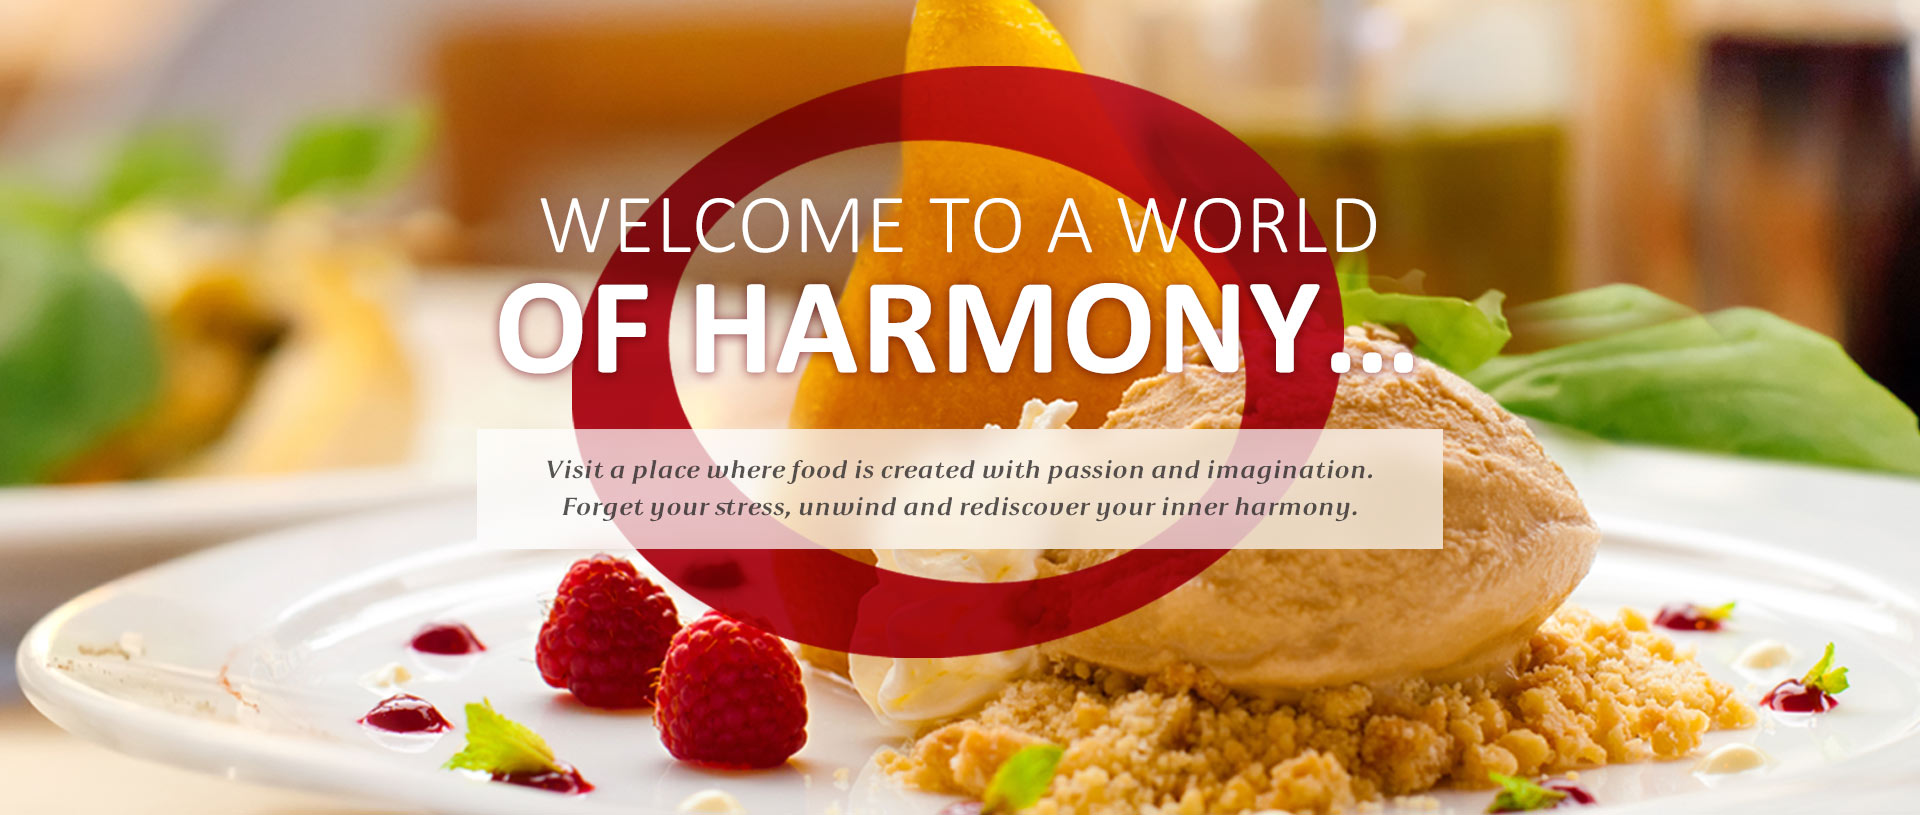 Harmony Restaurant - Second slider image